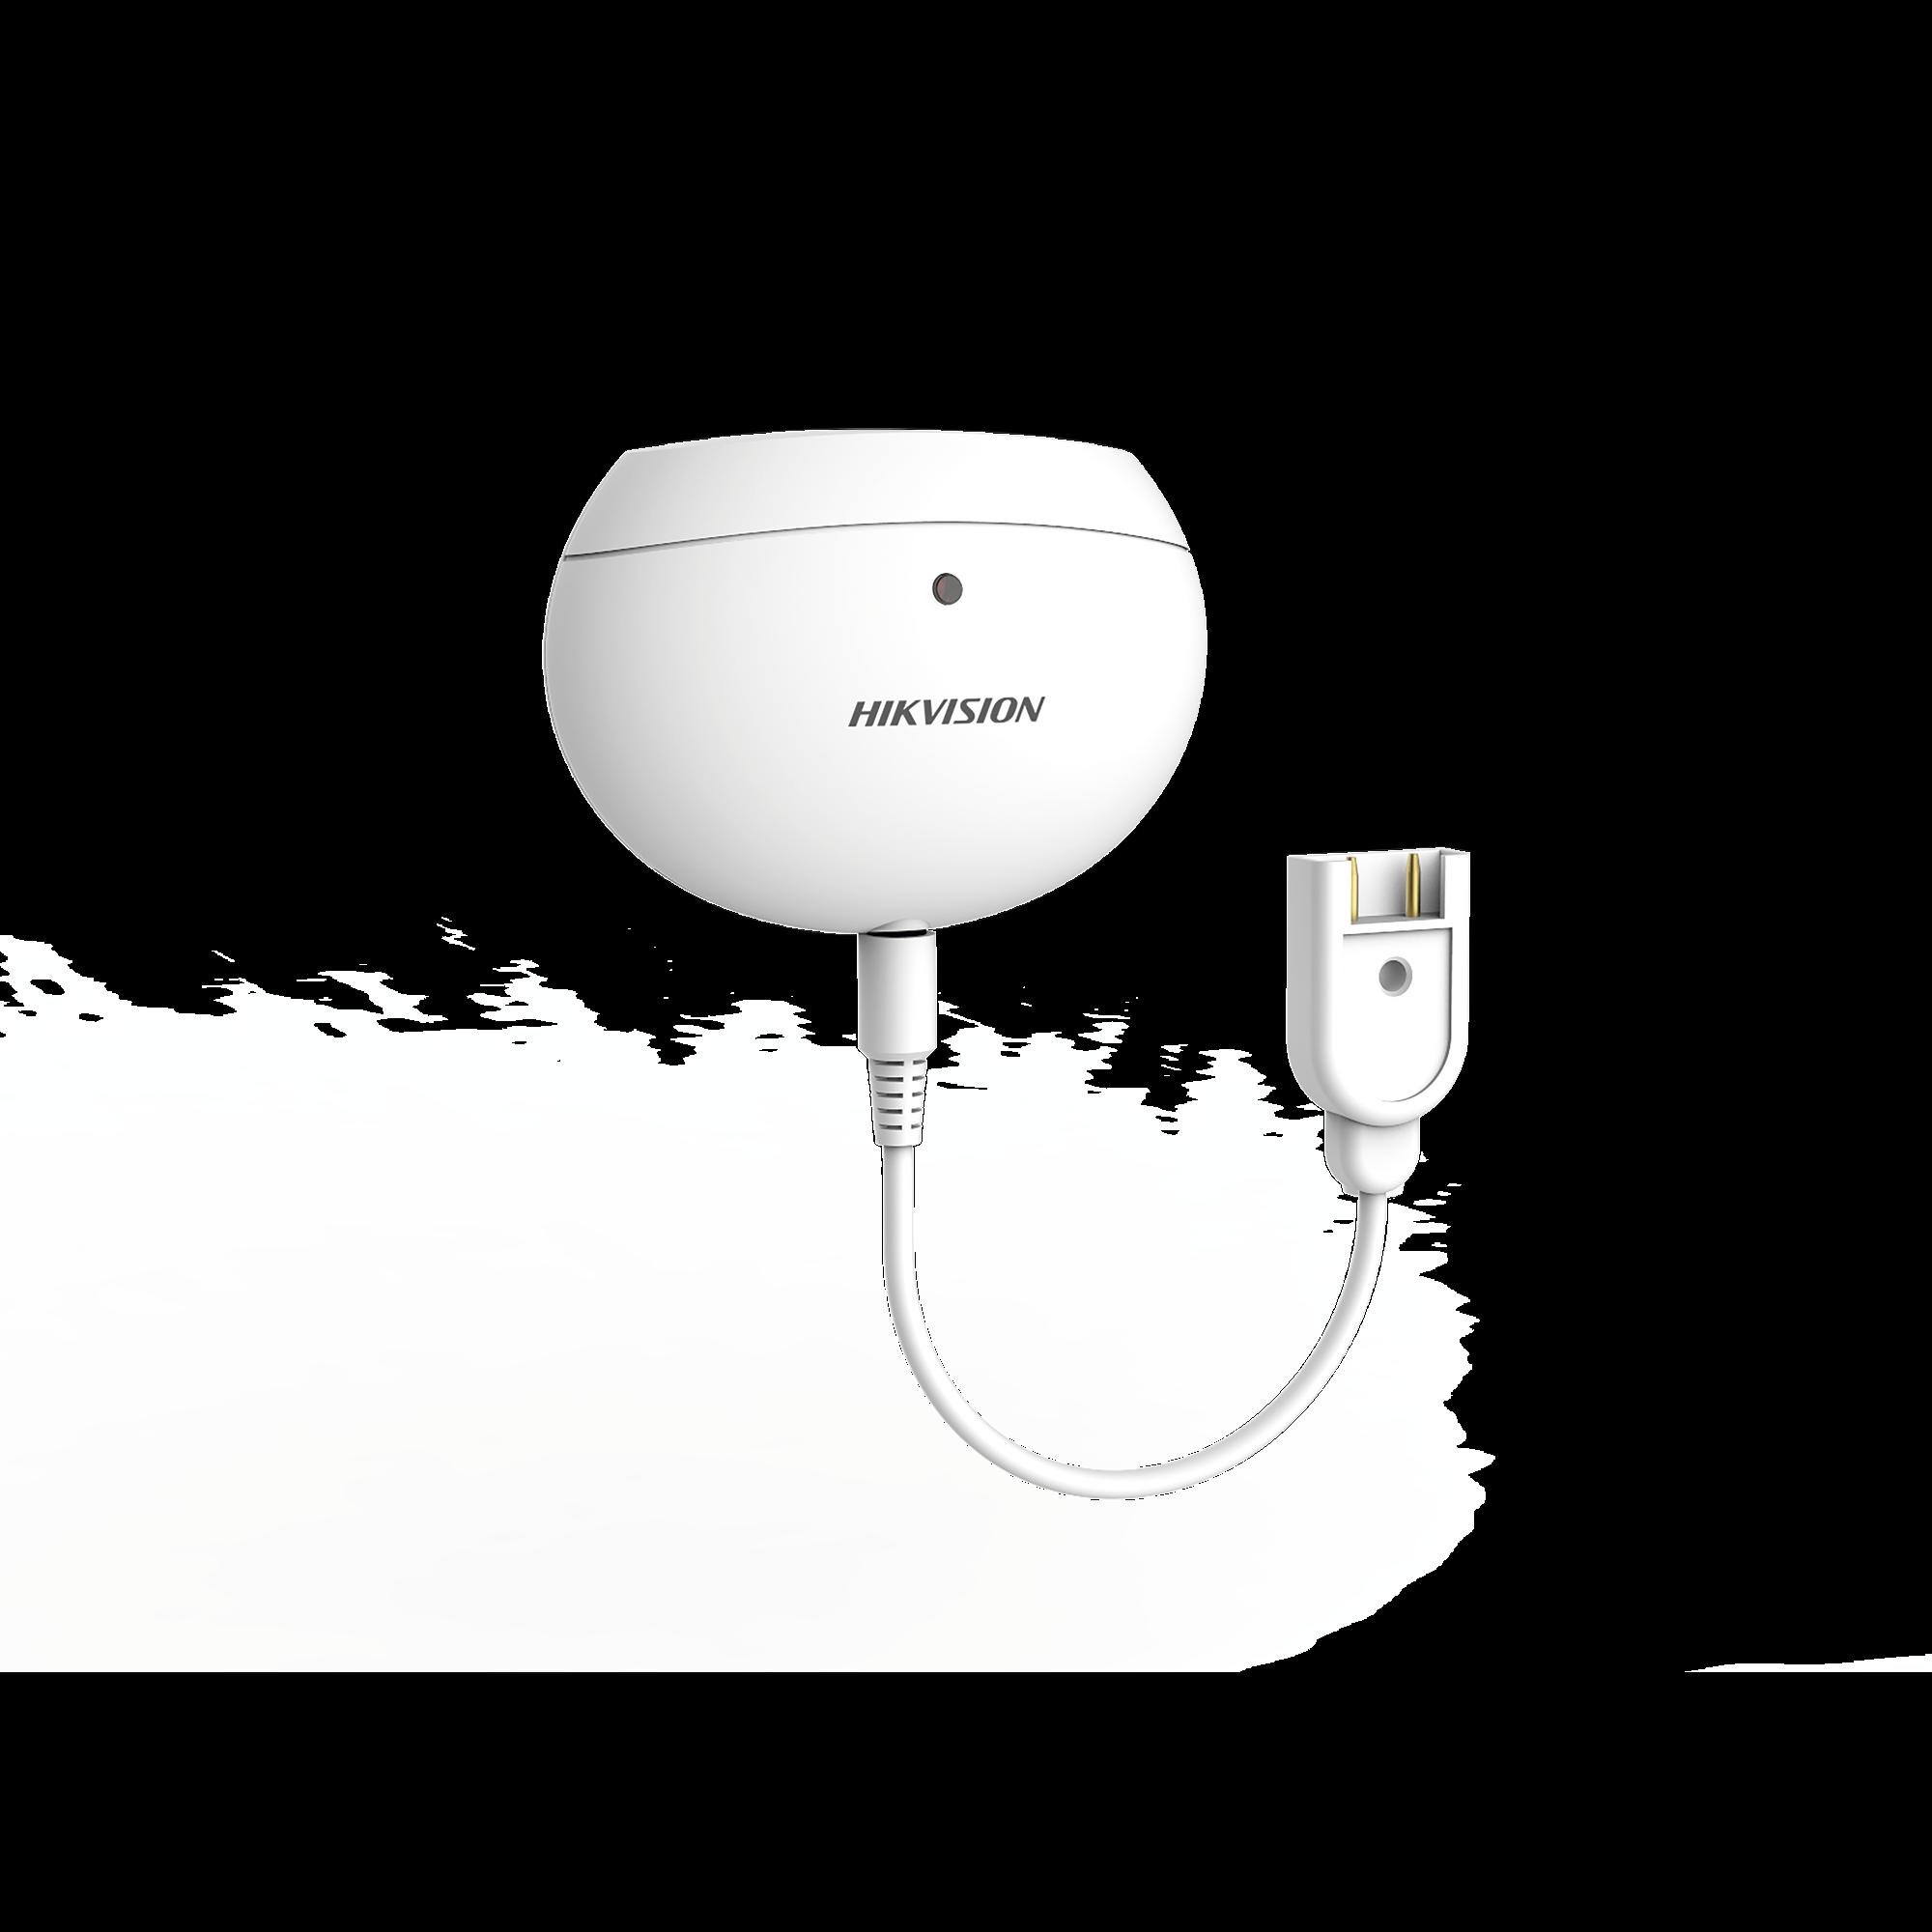 (AX HUB) Detector de fugas de agua inalámbrico para panel de alarma HIKVISION